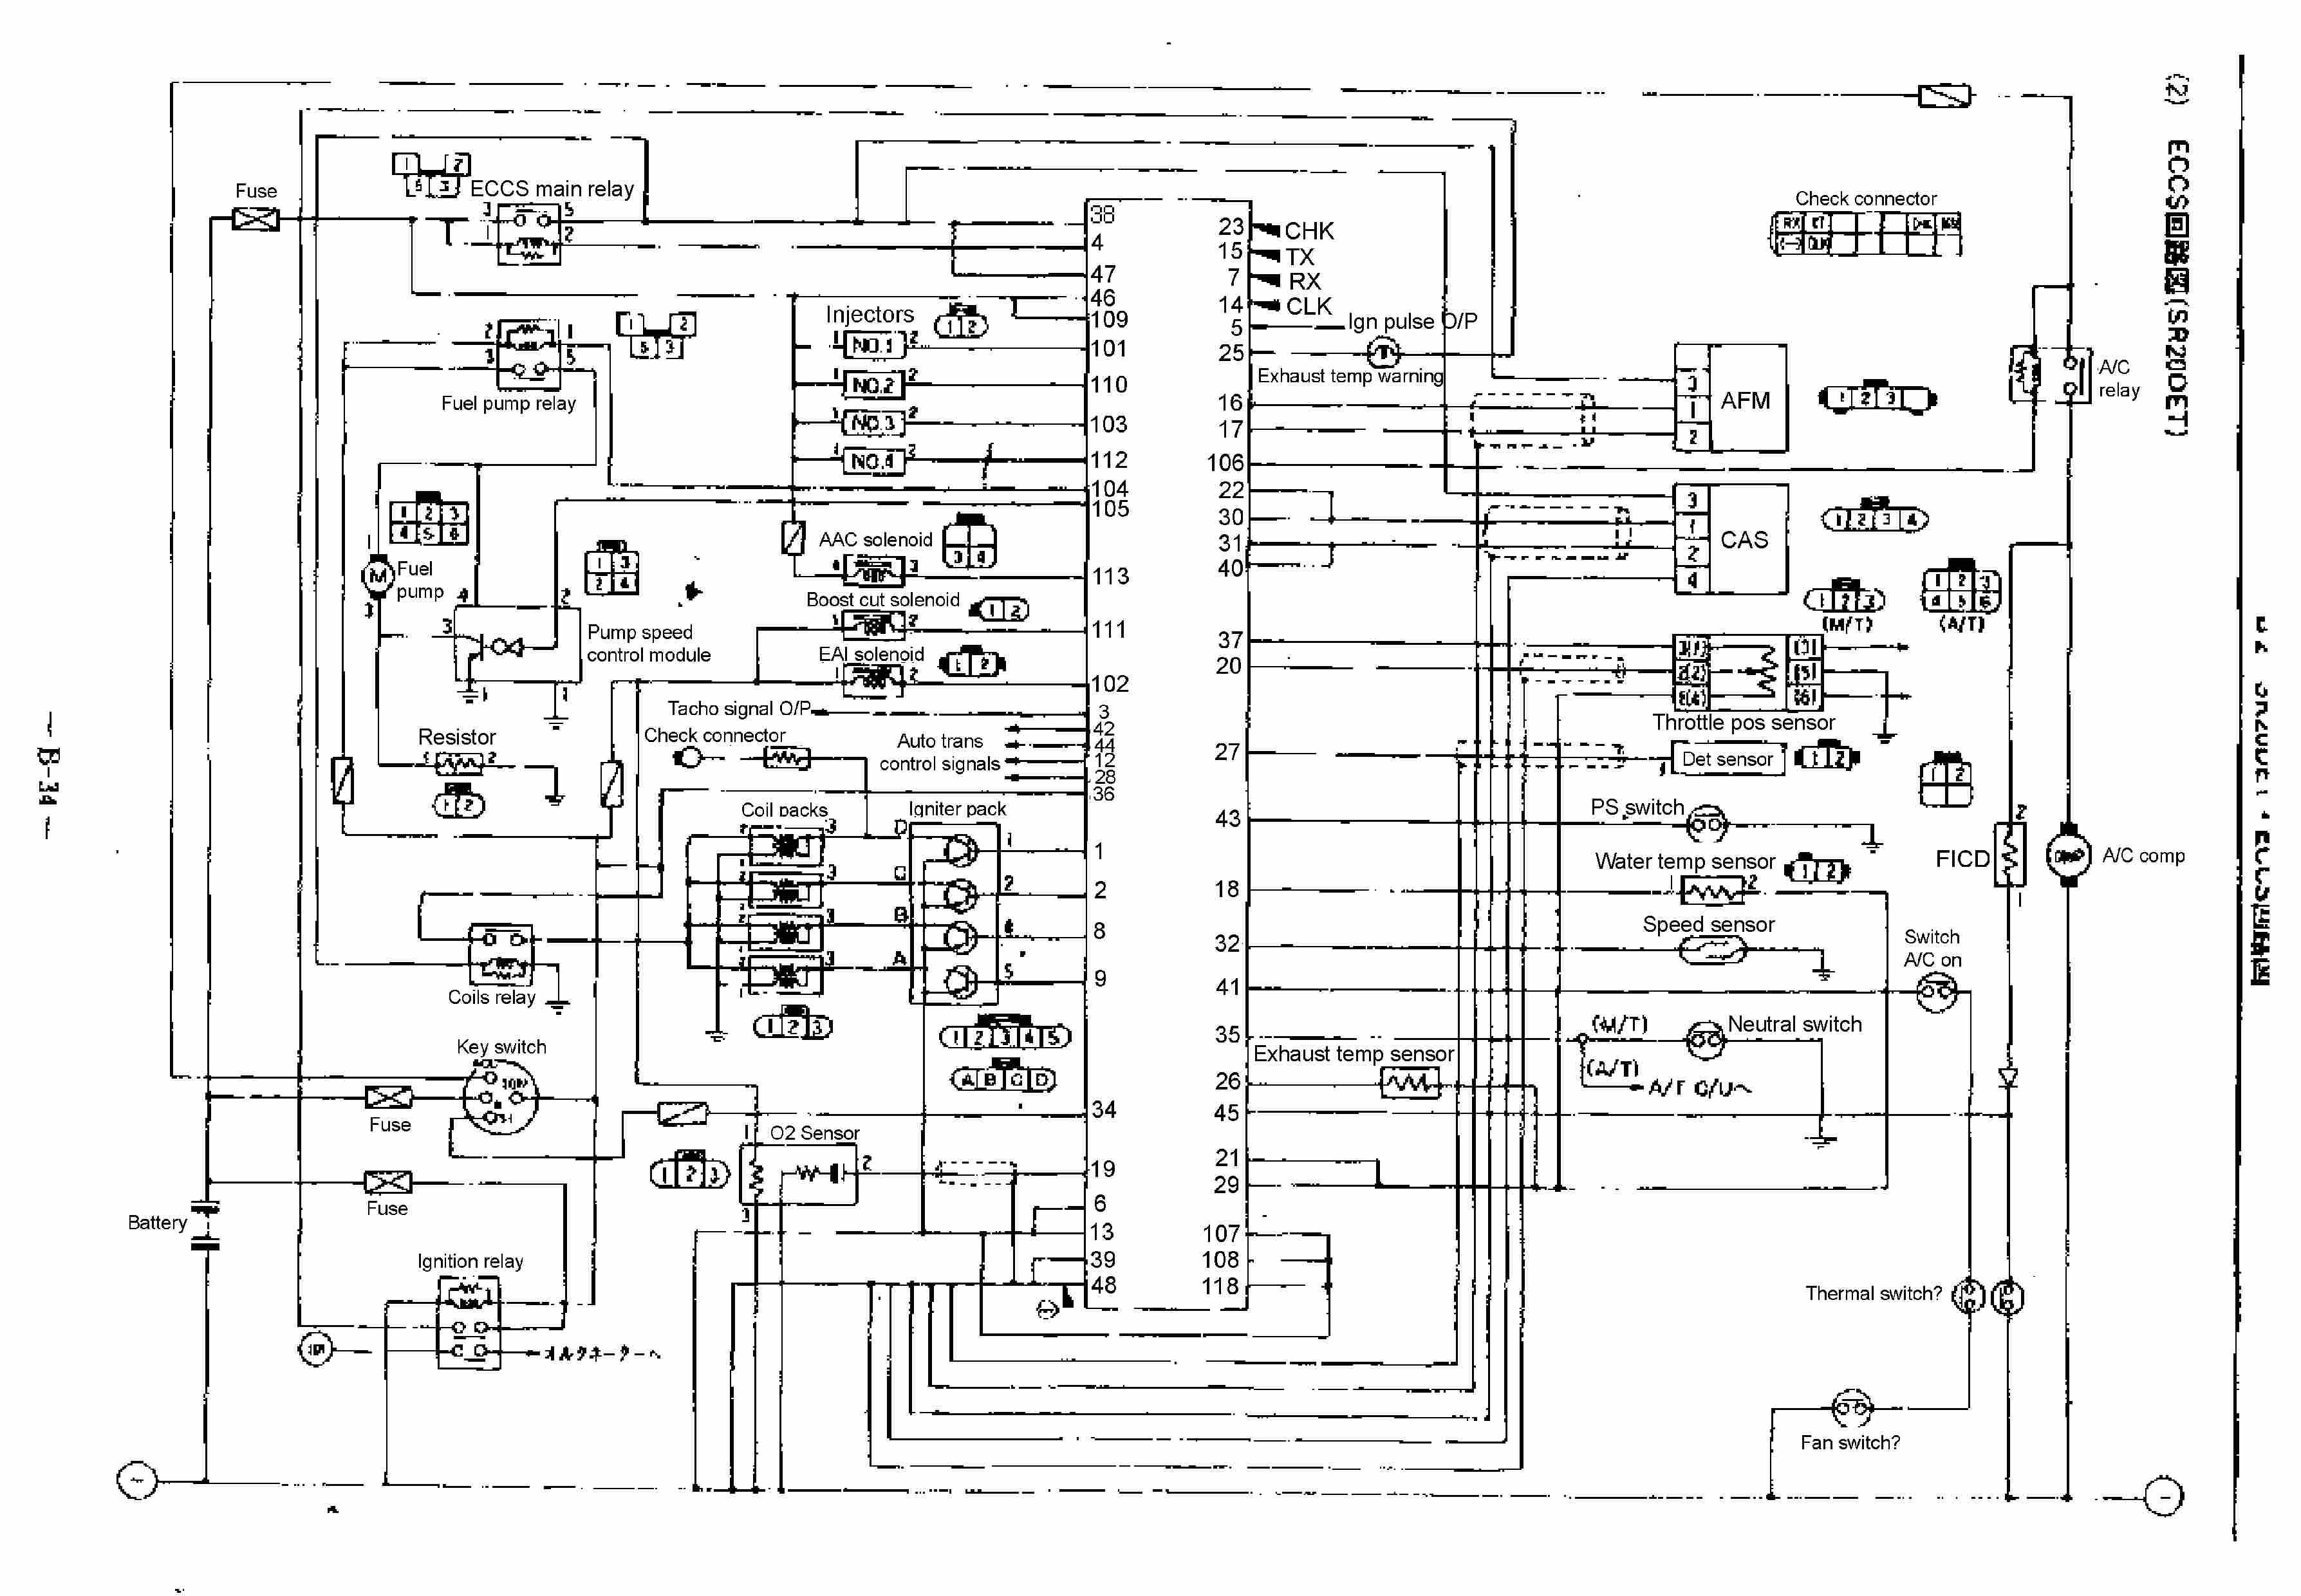 bmw e83 engine diagram wiring diagram librarybmw e83 relase hatch switch wiring diagrams simple wiring diagrambmw [ 3575 x 2480 Pixel ]